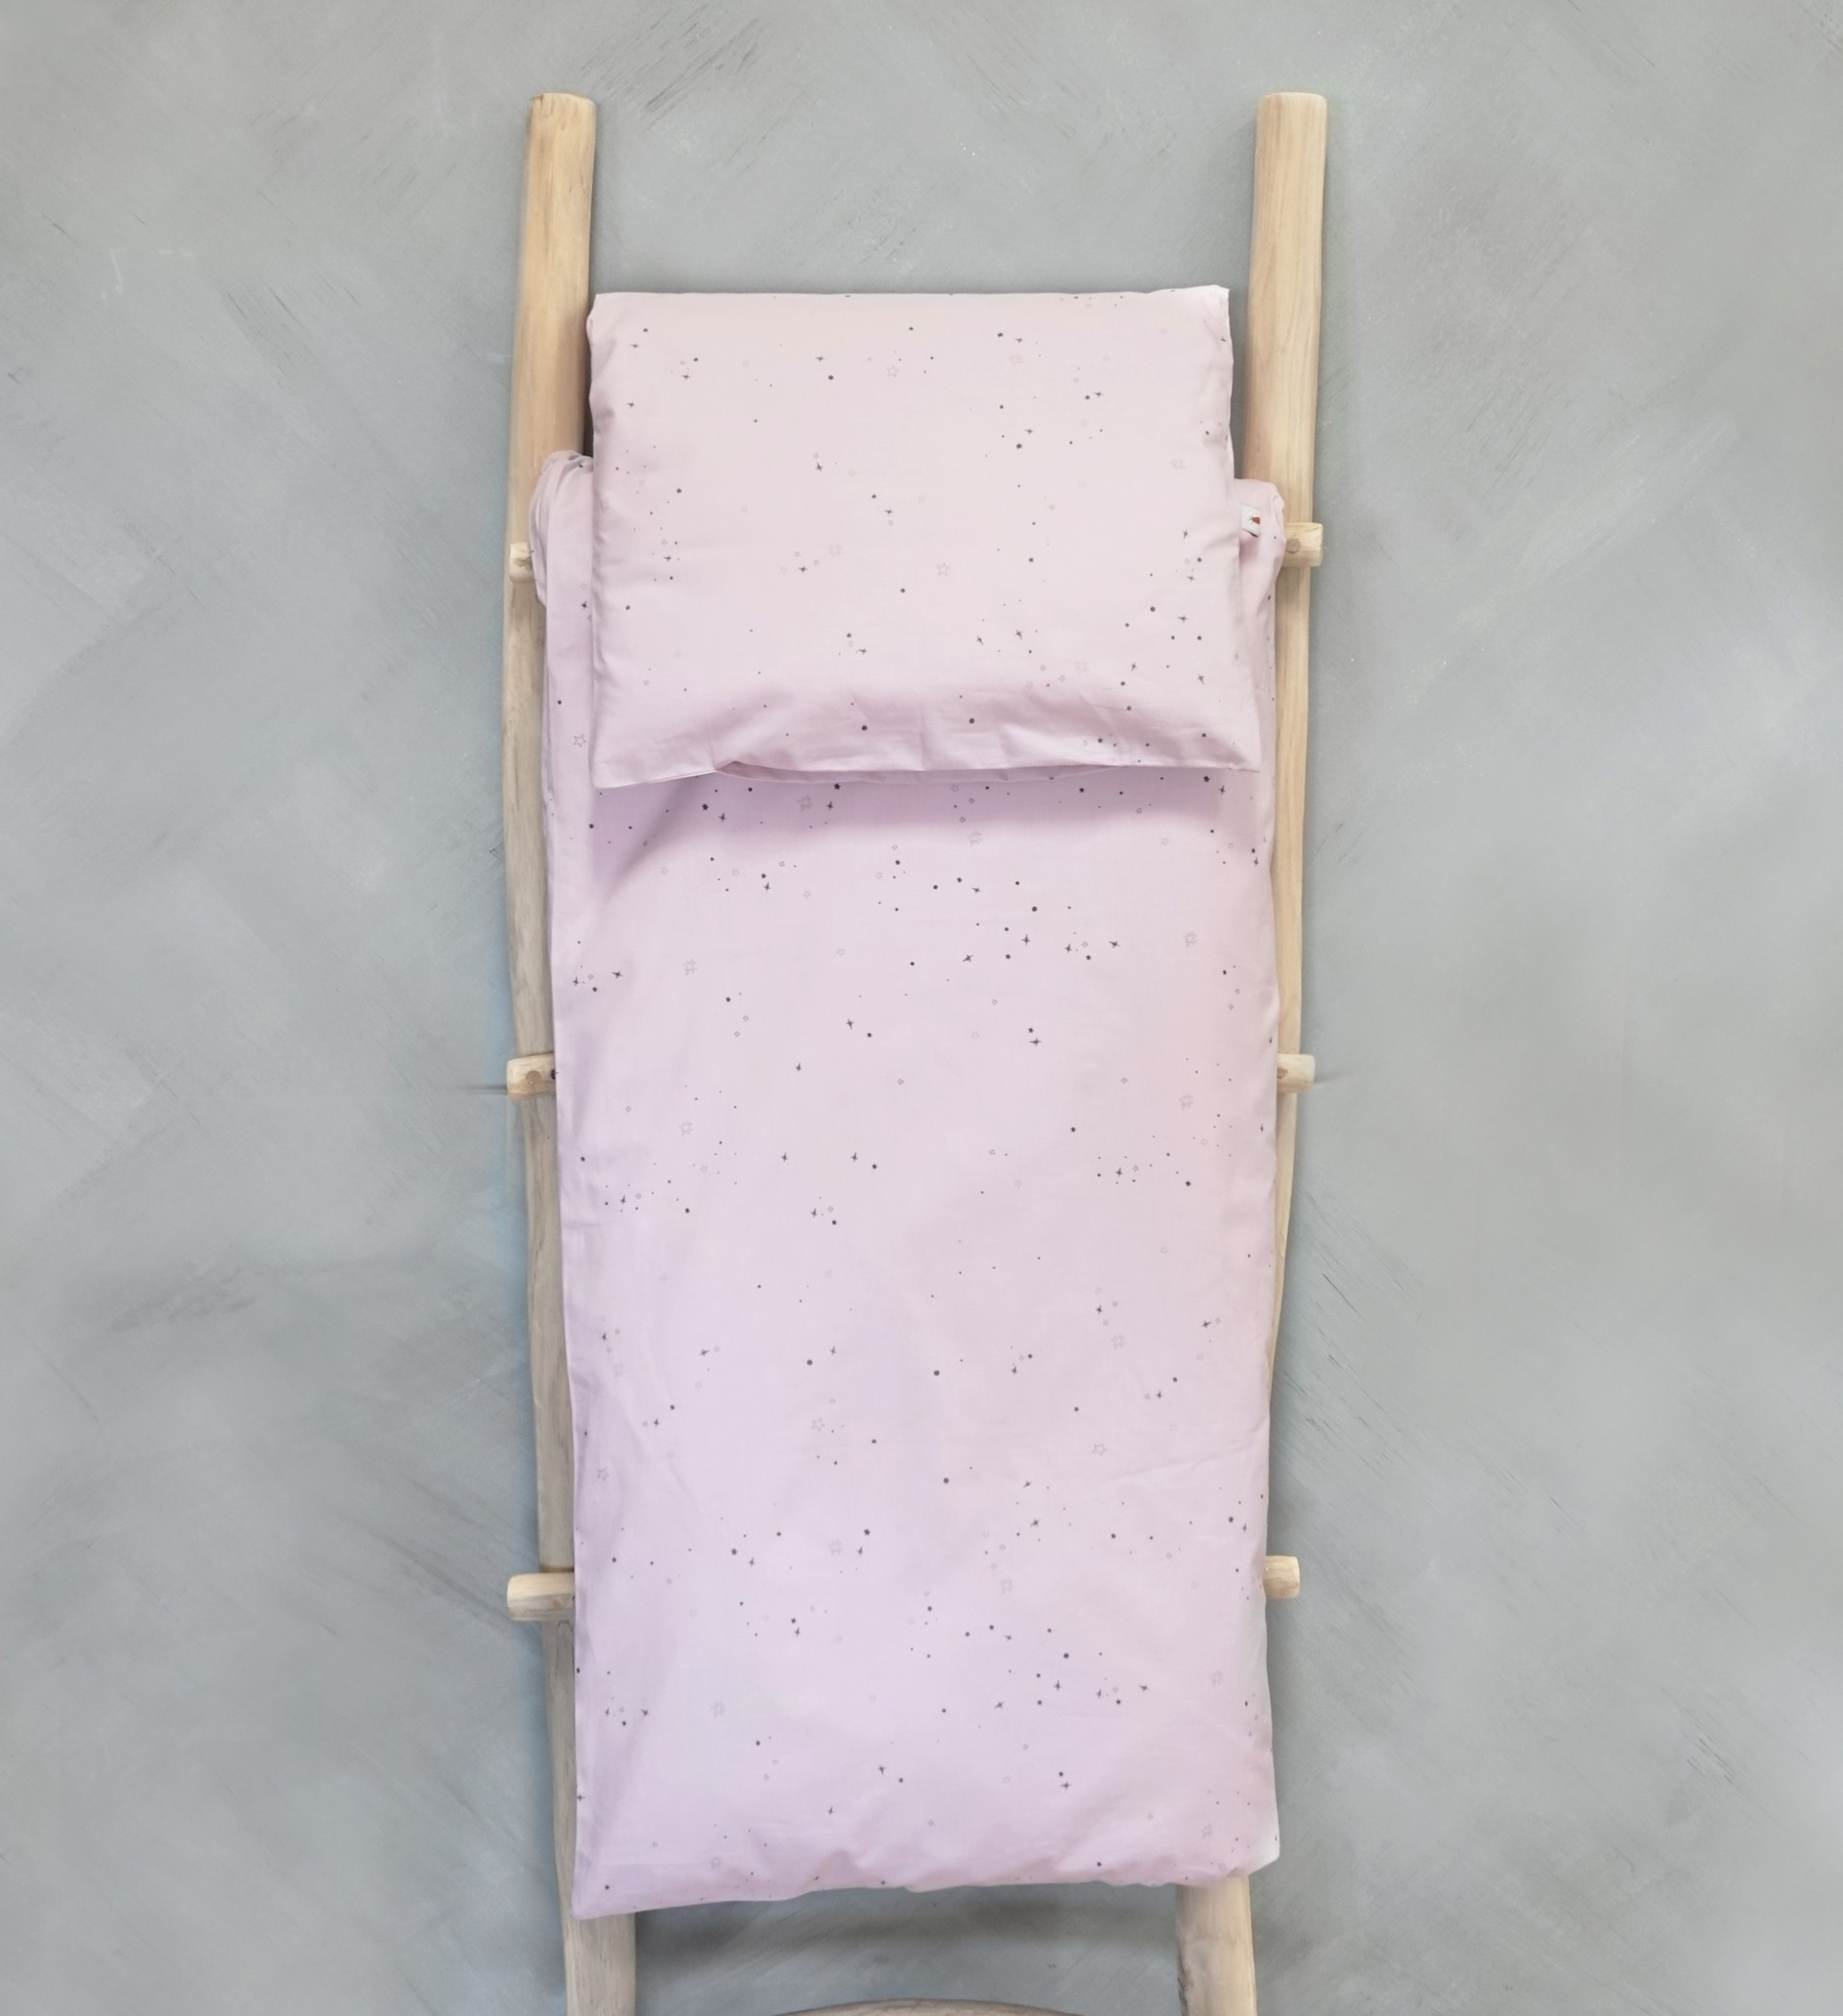 Baobaby presvlaka za poplun i jastučnica - Pixie Stardust